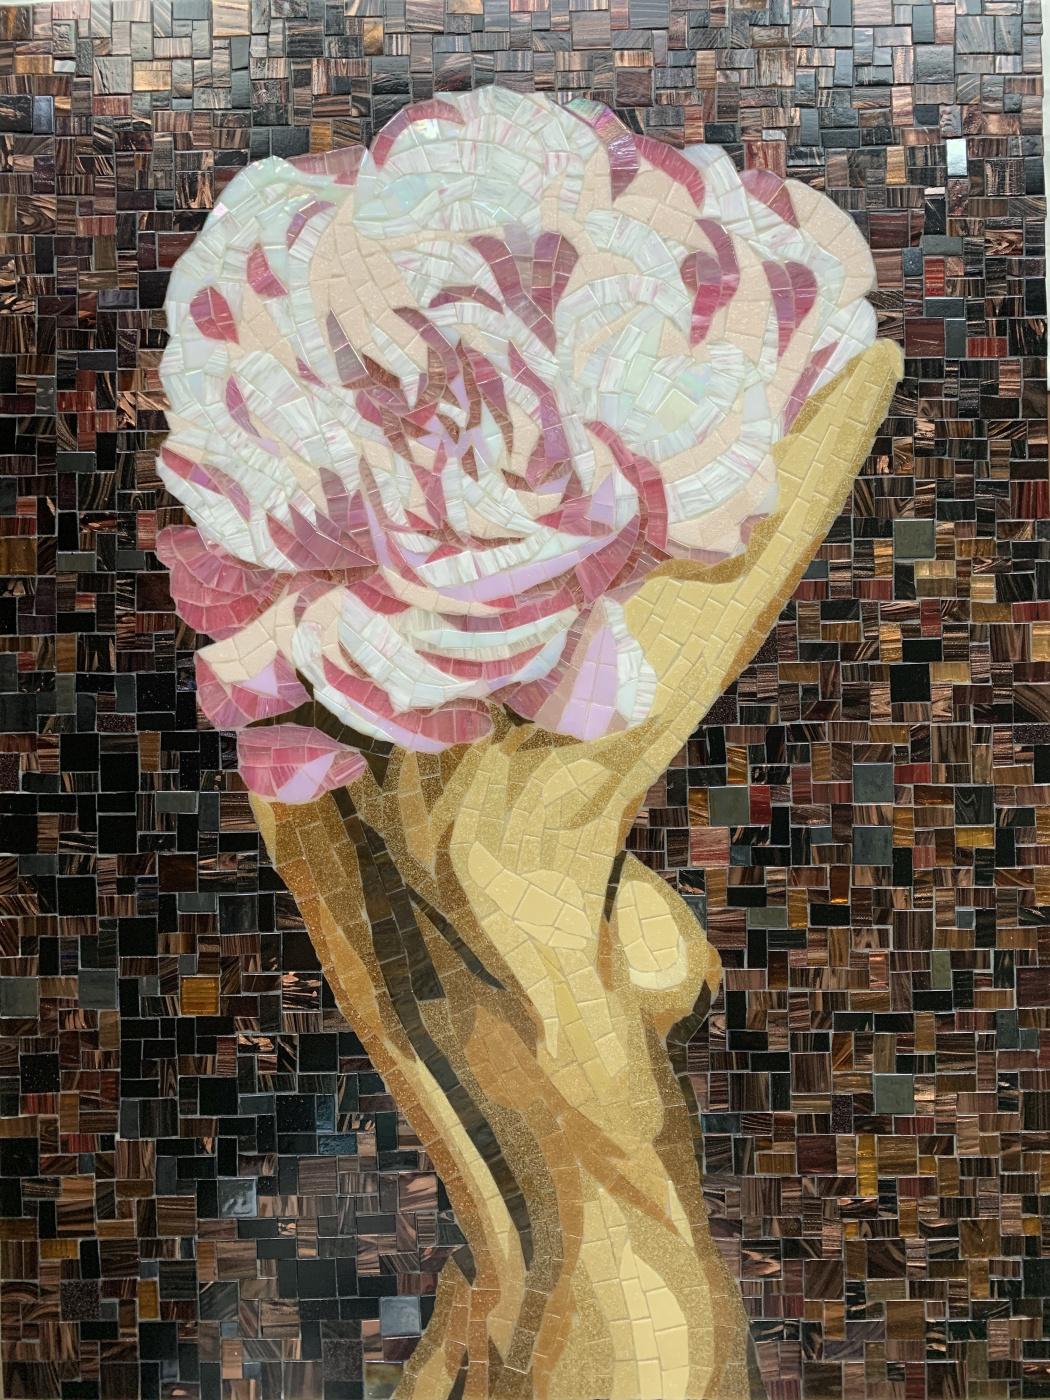 Olesya Vyacheslavovna Pisarenko. Diva Rose. Based on the painting by Amy Jadd